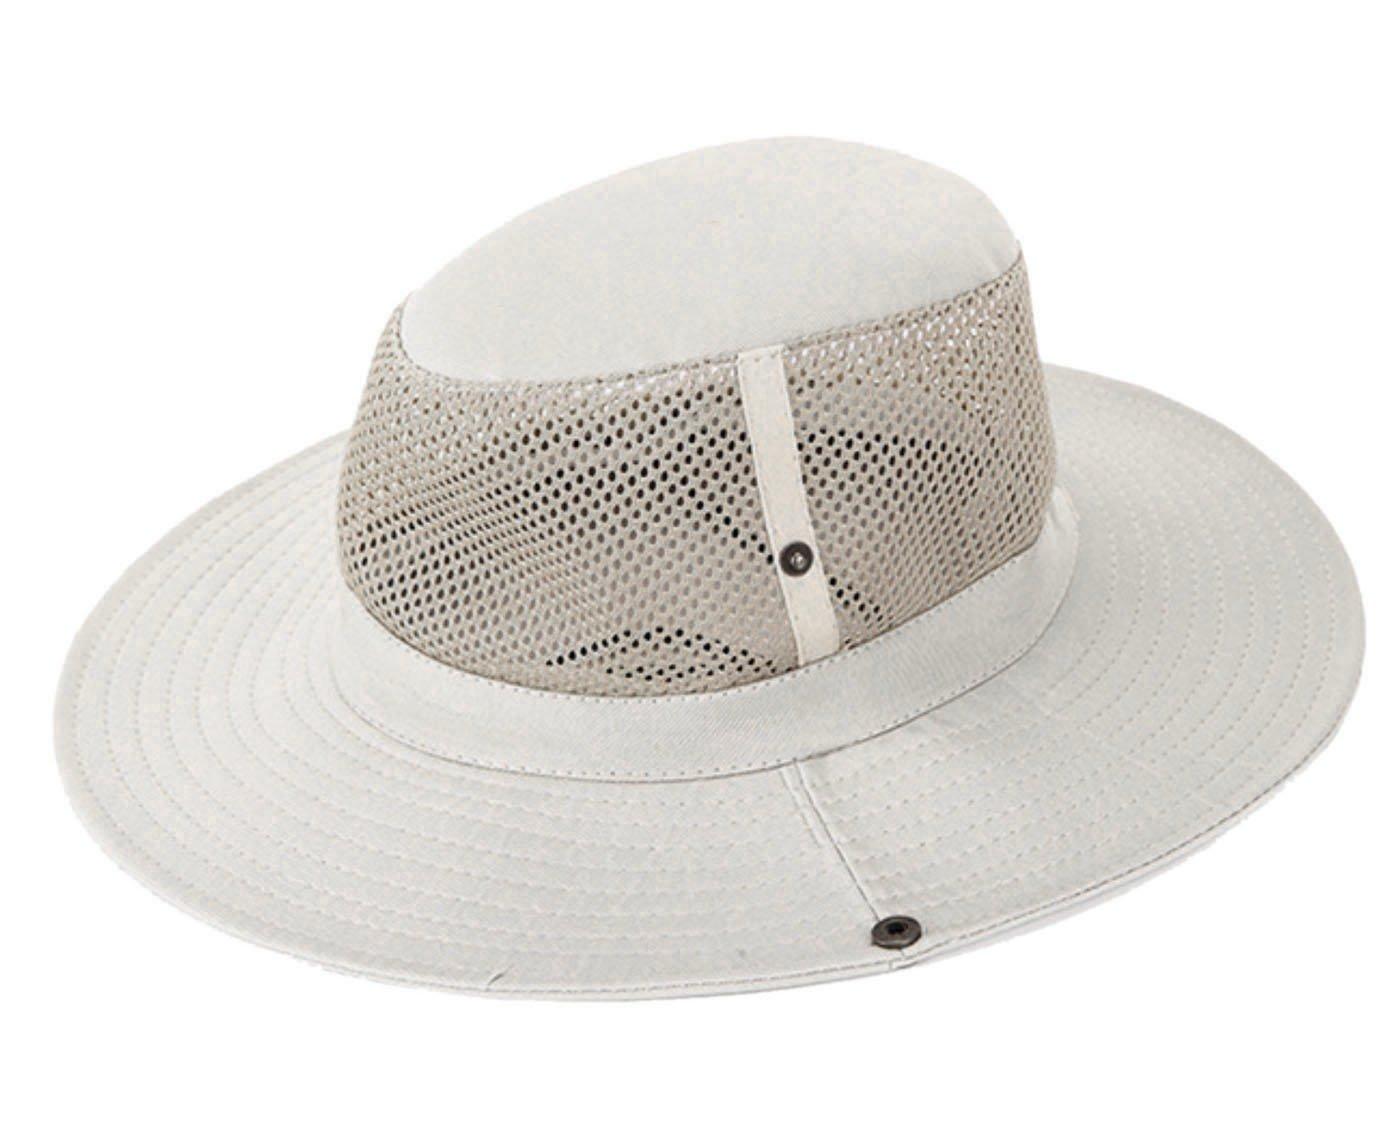 AOTU - Sombrero de Pescador Camping Senderismo Gorro de Sol al Aire Libre de Ala Malla Transpirable con Barbijo para Unisex - Beige